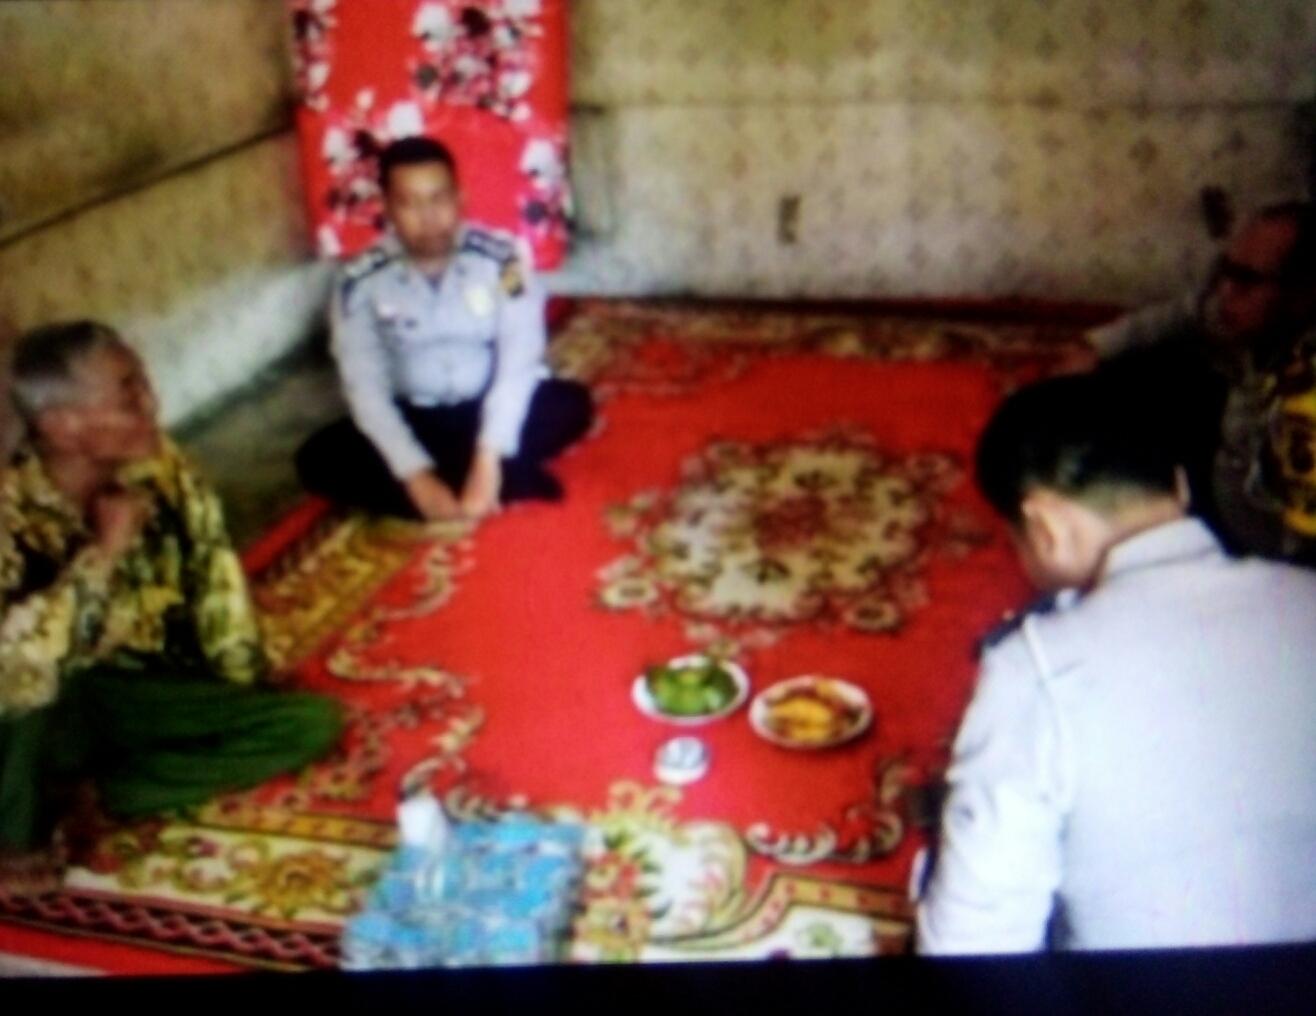 Giat (LDD) Polantas Banyuasin Beri Sembako Warga Kurang Mampu